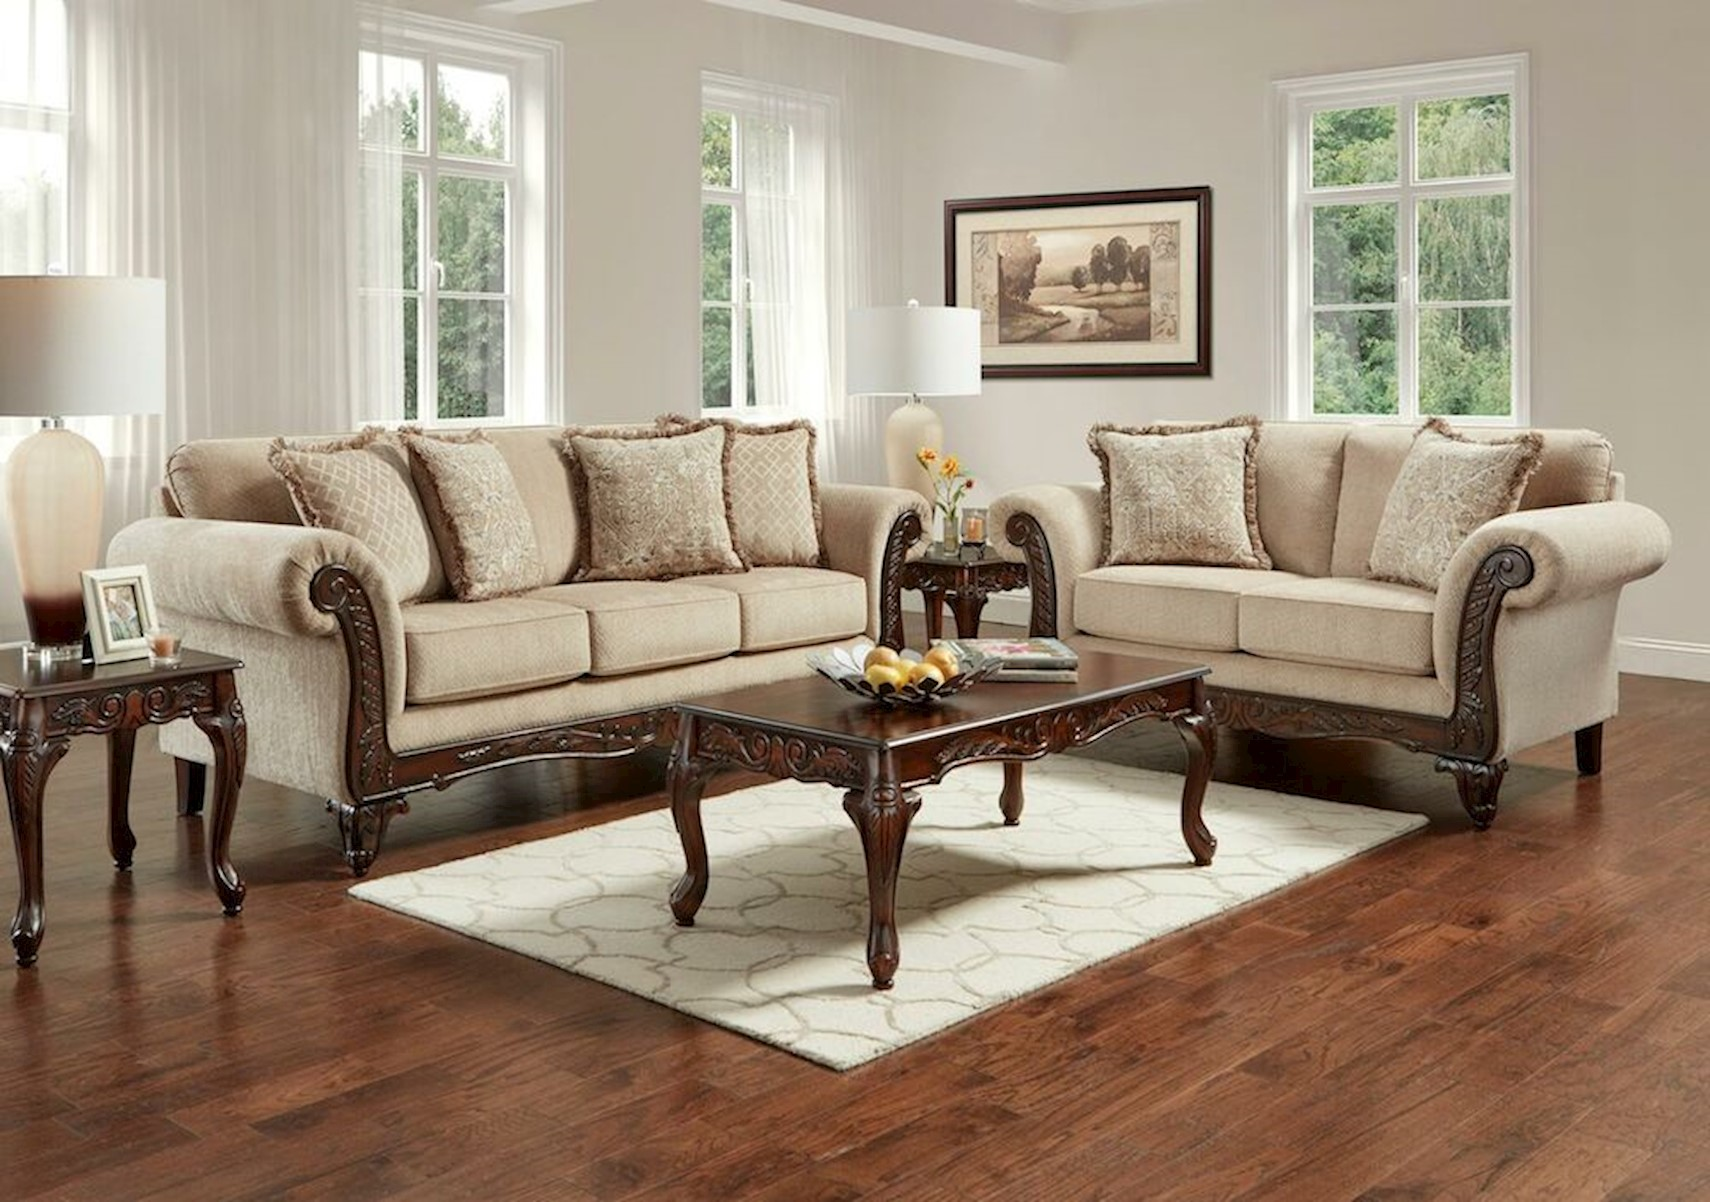 Lacks | Emory 2-Pc Living Room Set